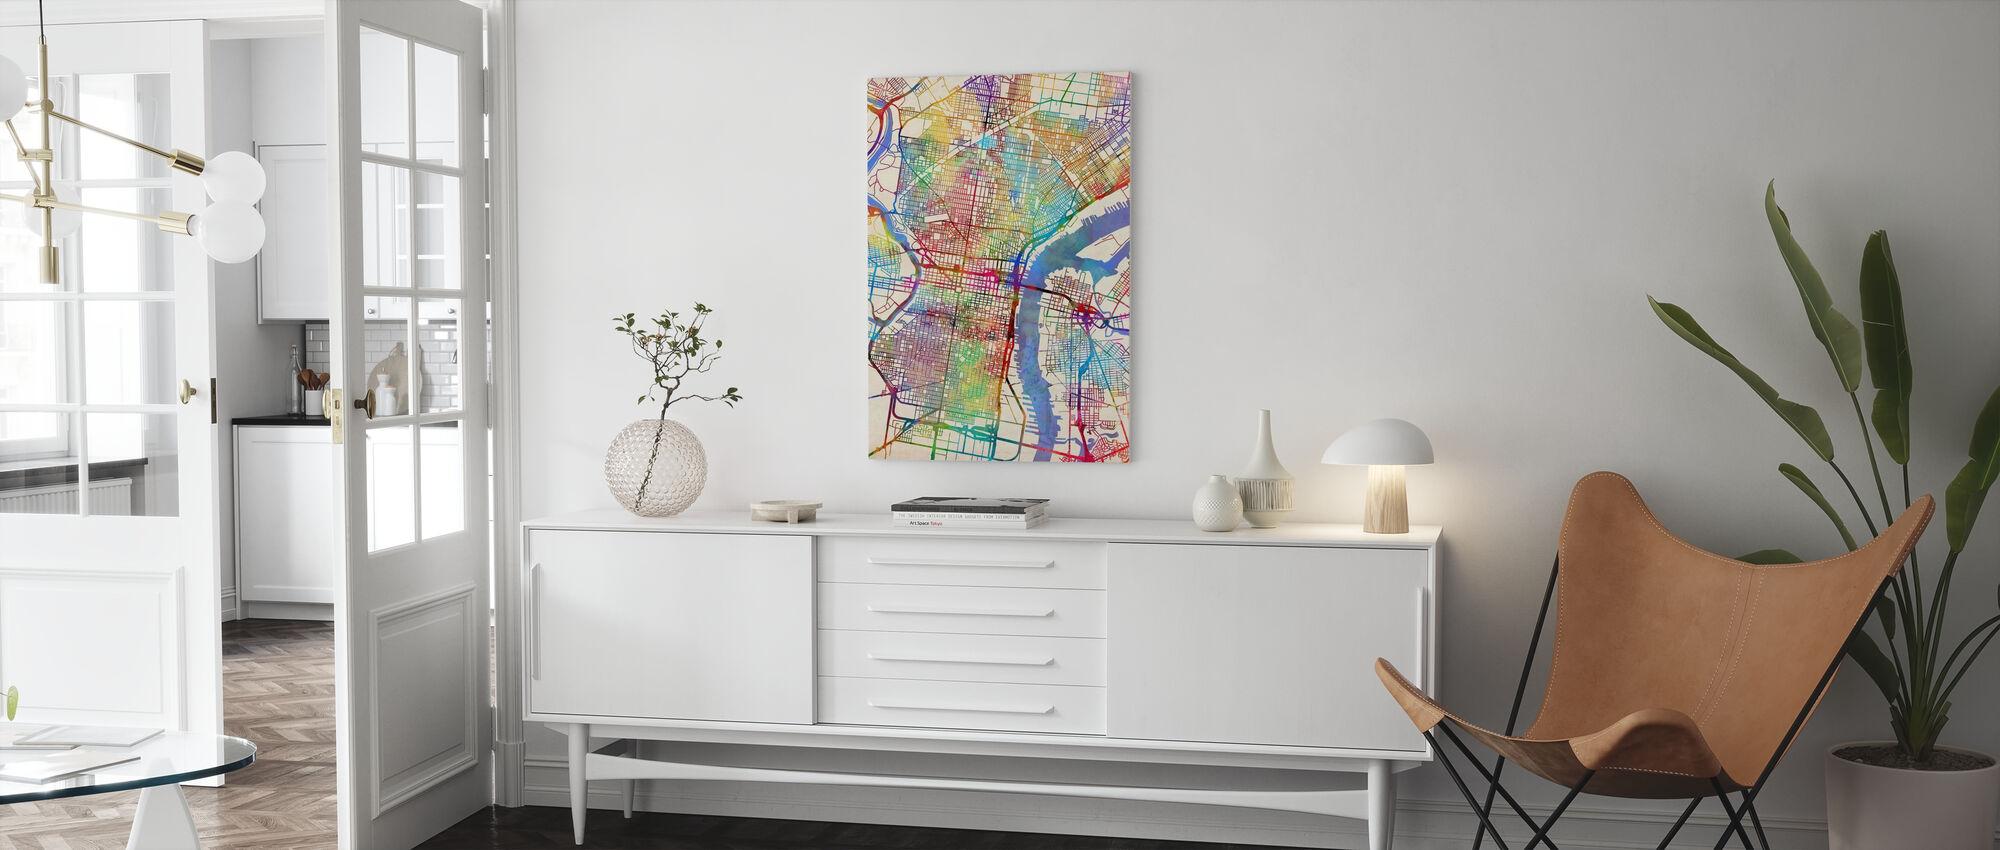 Philadelphia Pennsylvania City Street Map - Canvas print - Living Room